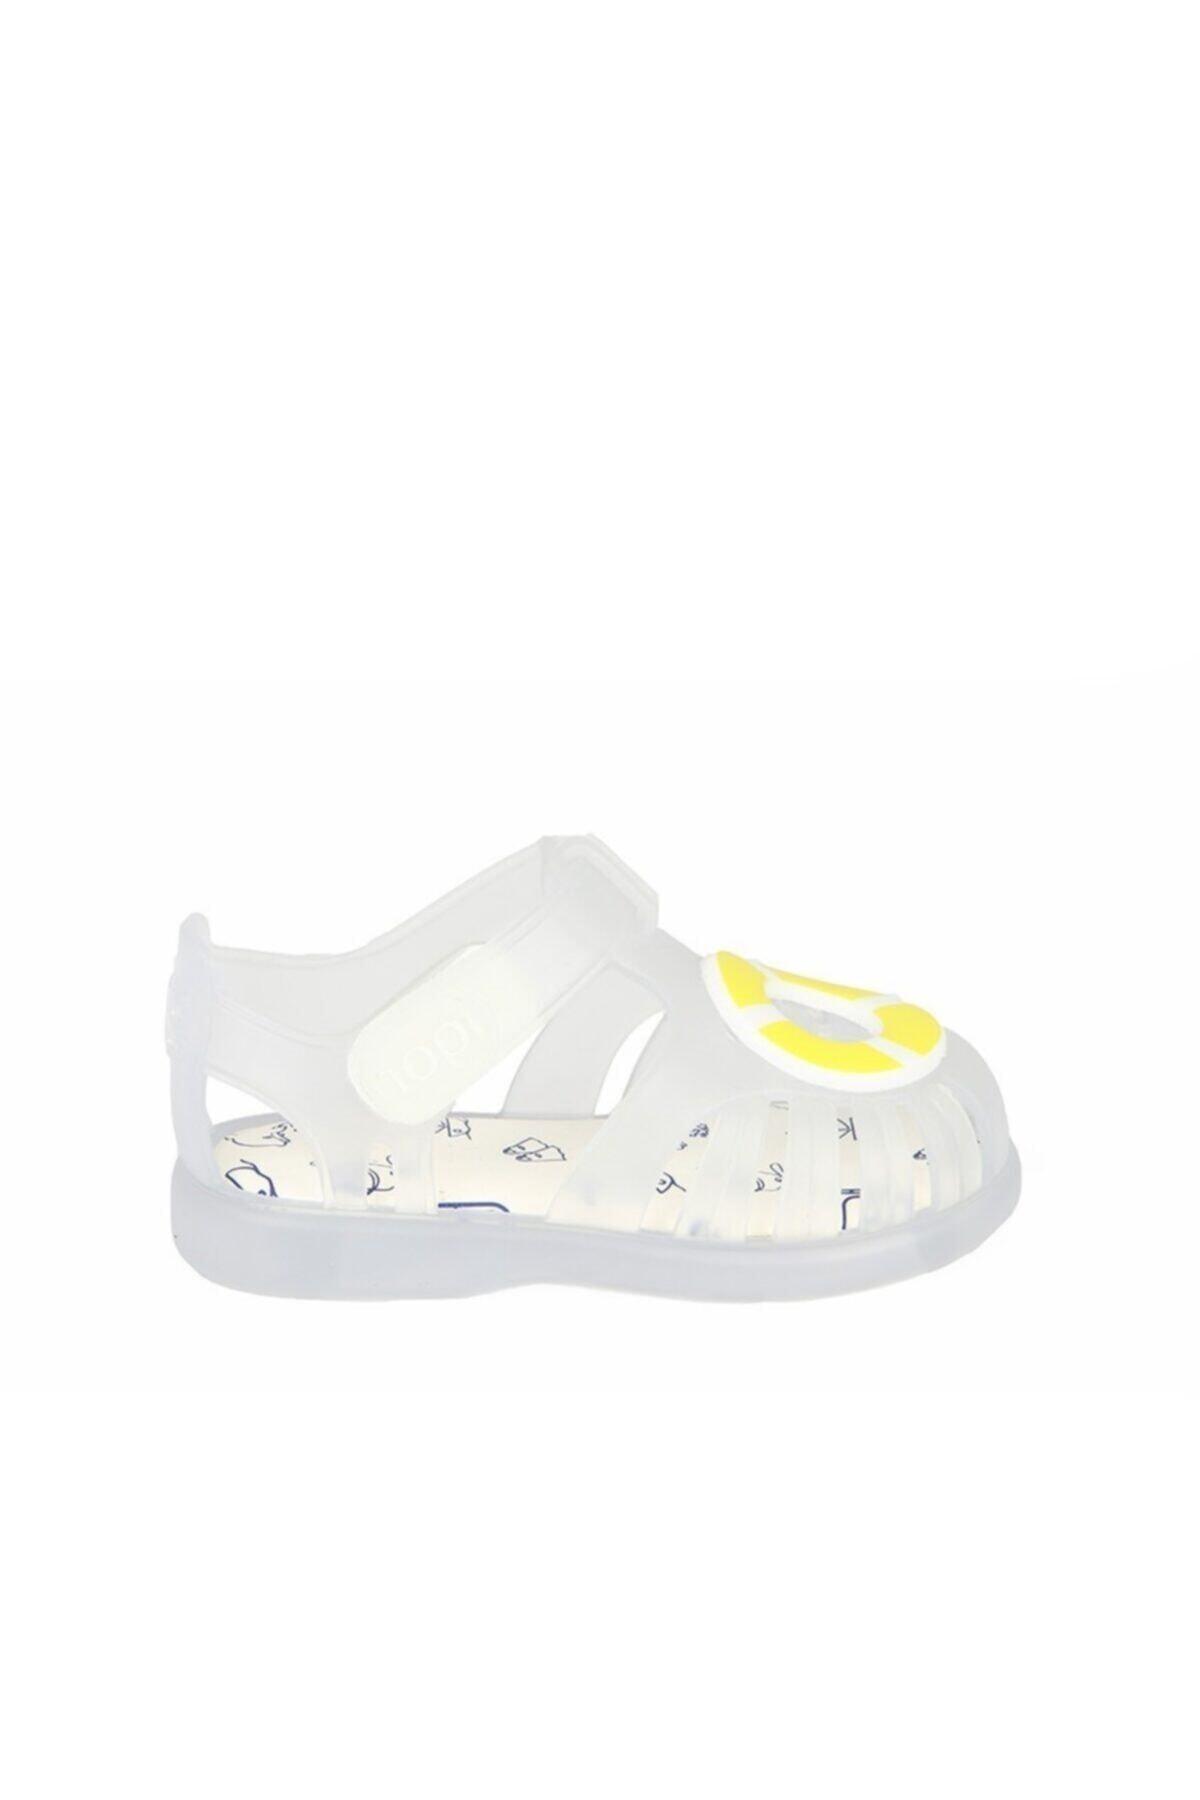 IGOR S10234 Tobby Velcro Estrella Sandalet 1